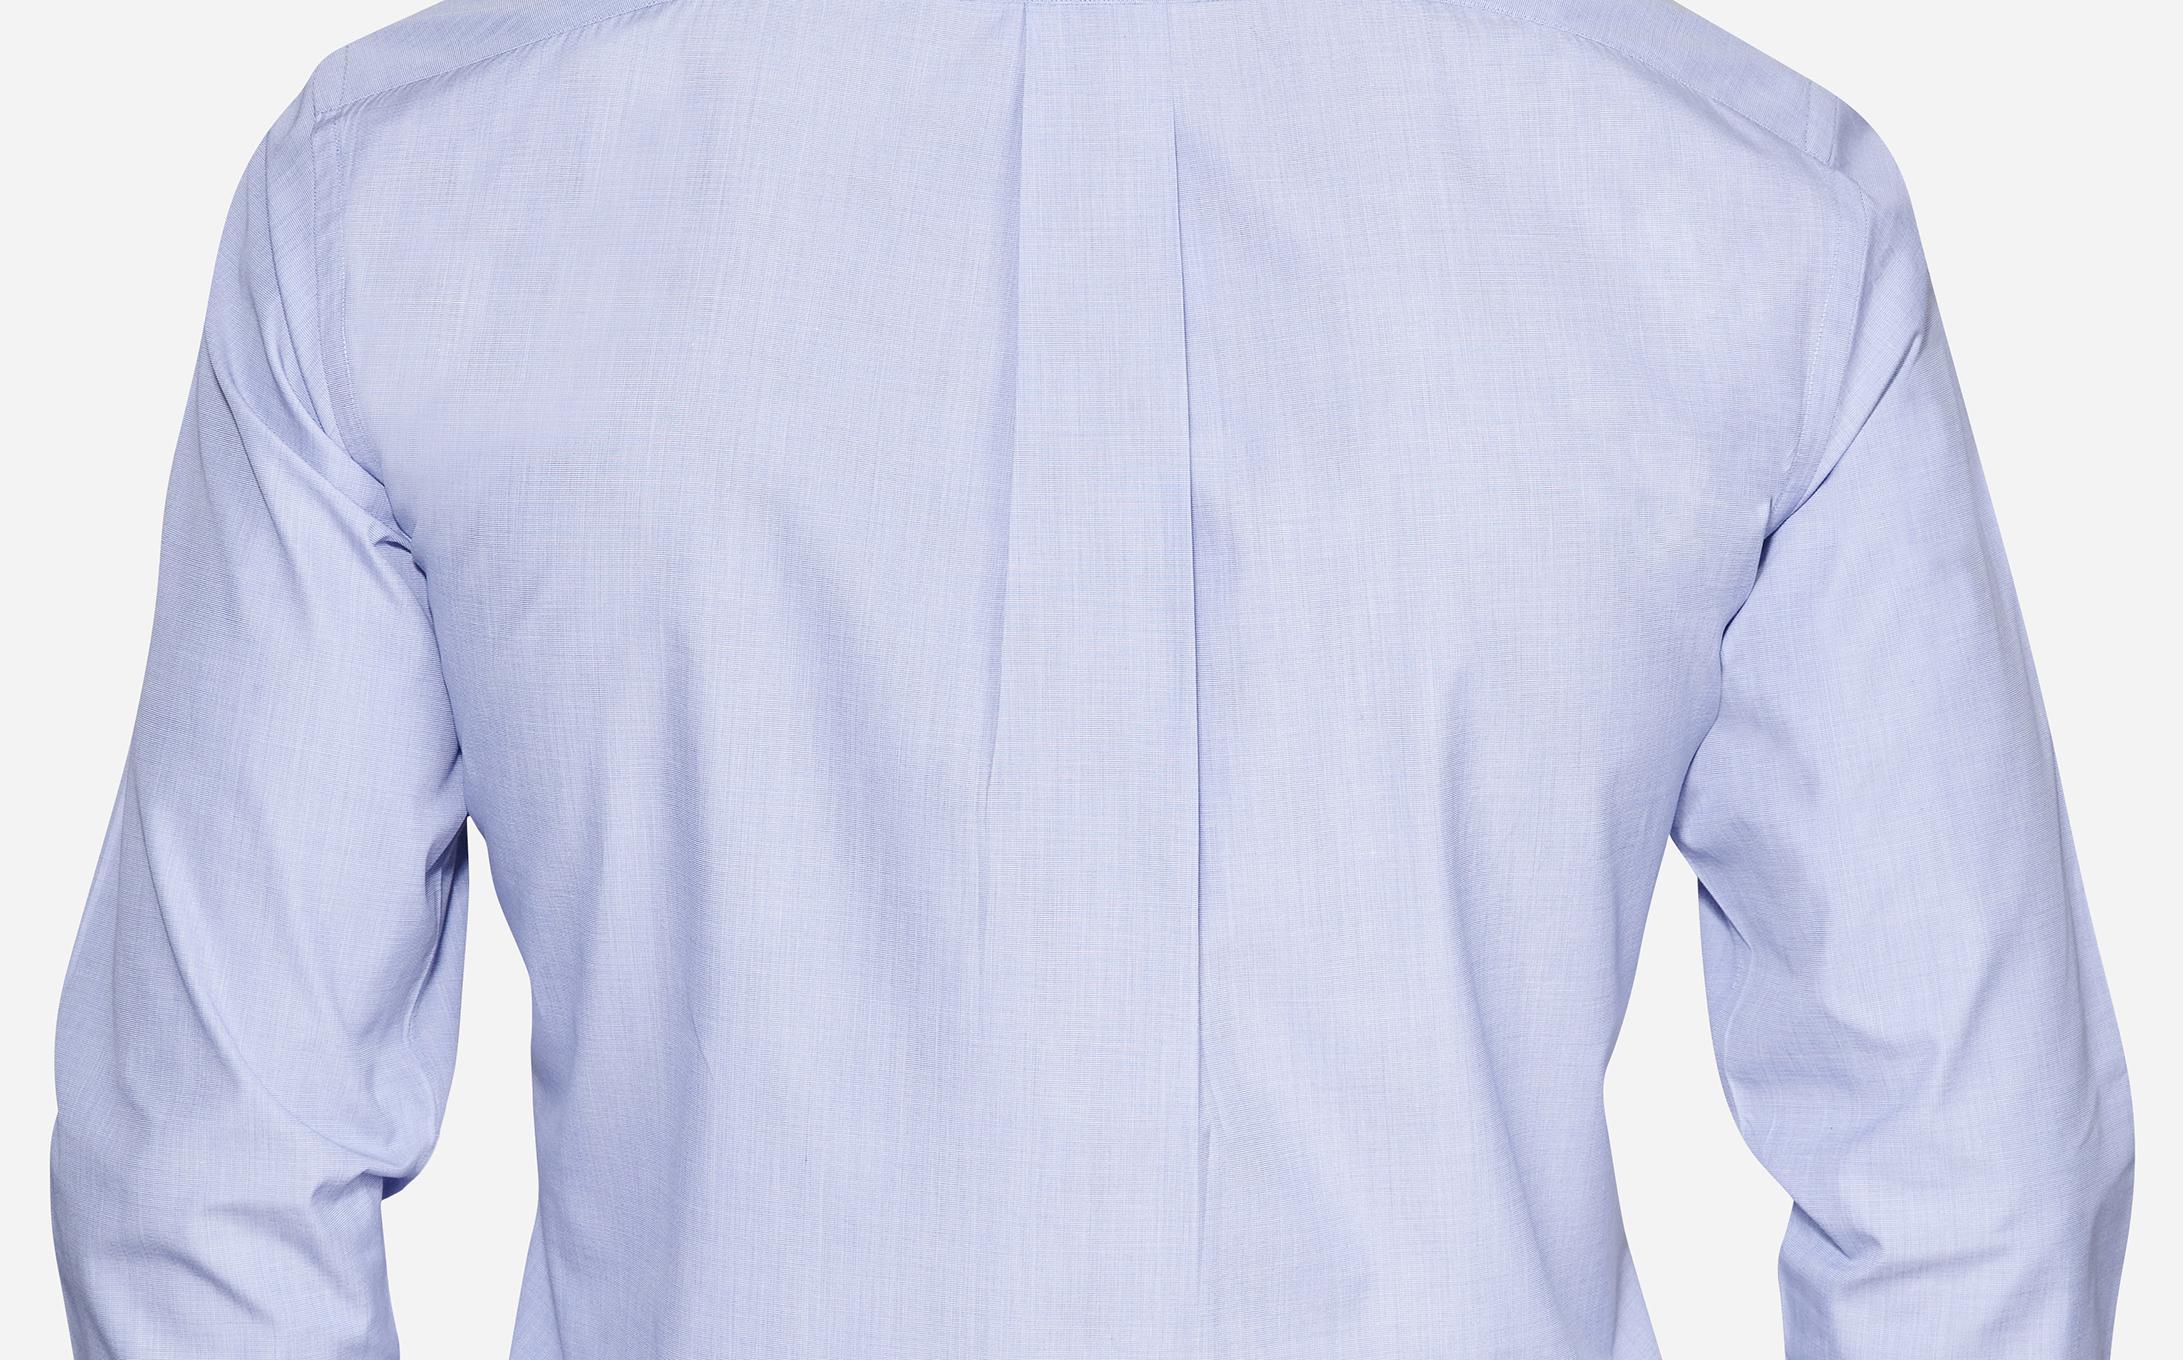 Box Pleat in Back shirt